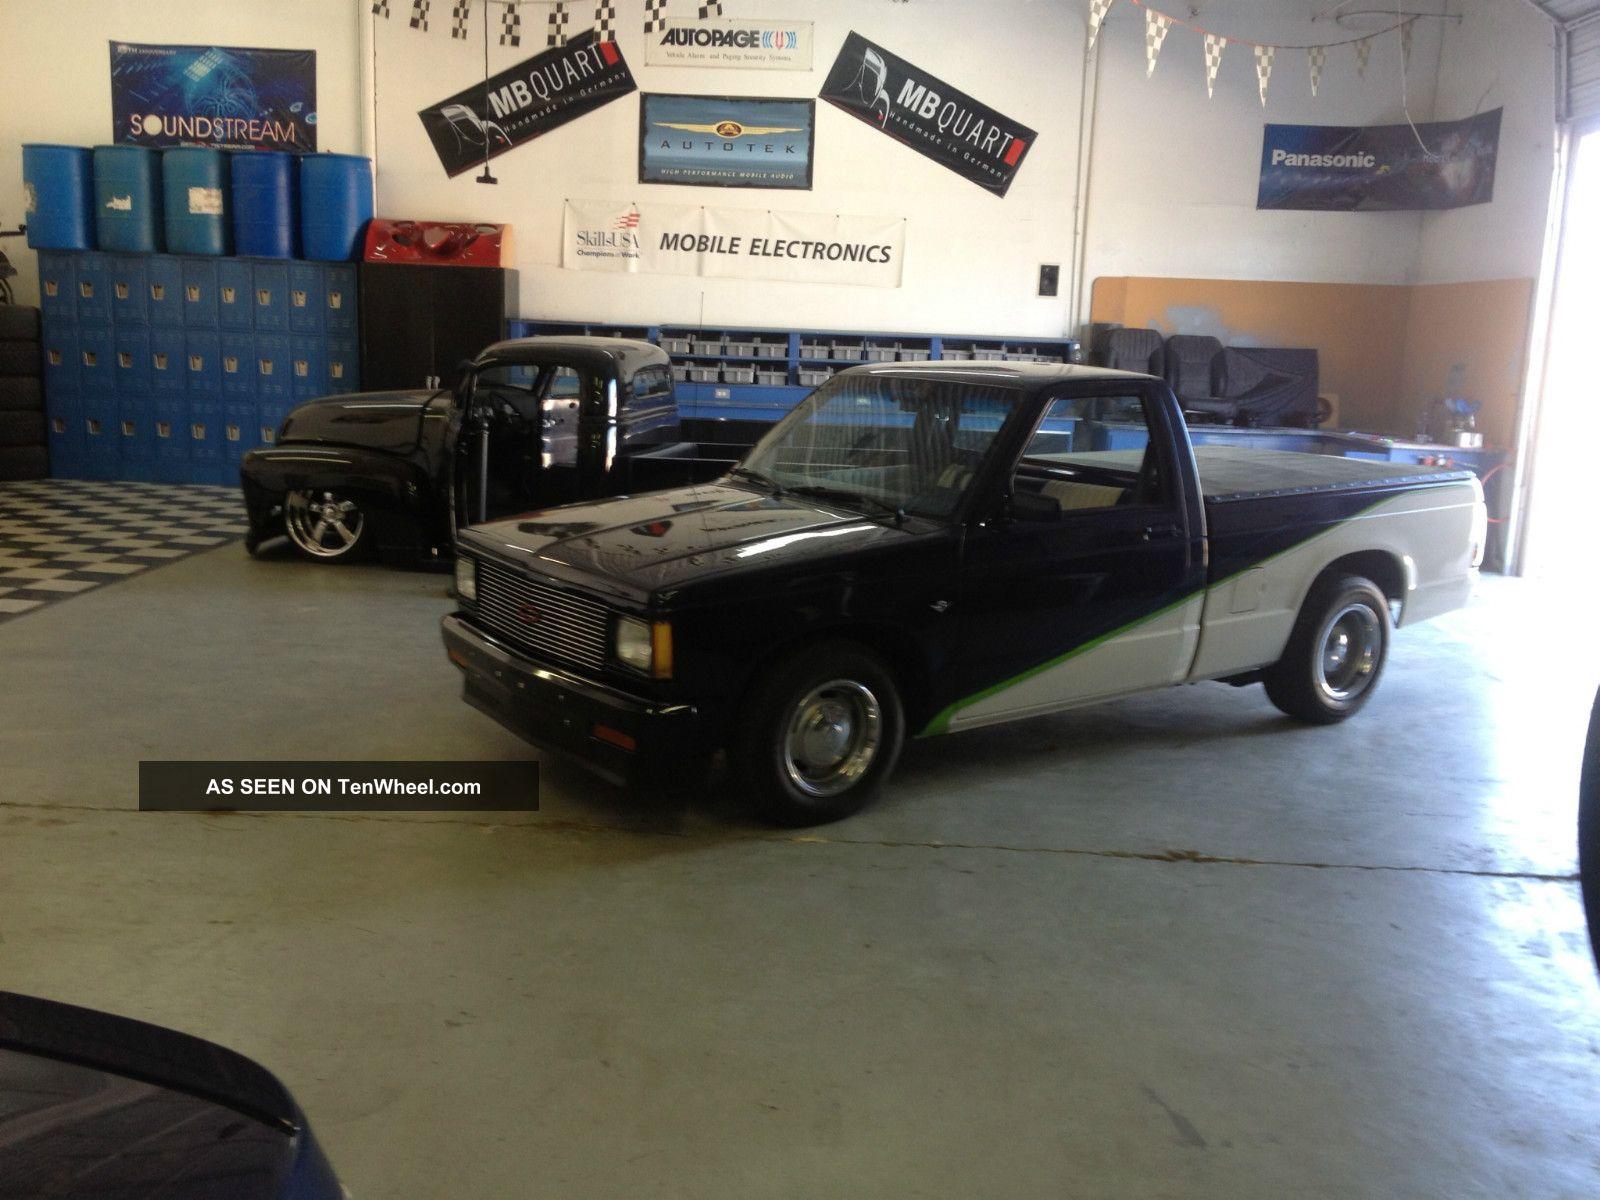 1986 Chevrolet S10 S - 10 Sbc 350 V8 Fast Custom Chevy Muscle Car S-10 photo